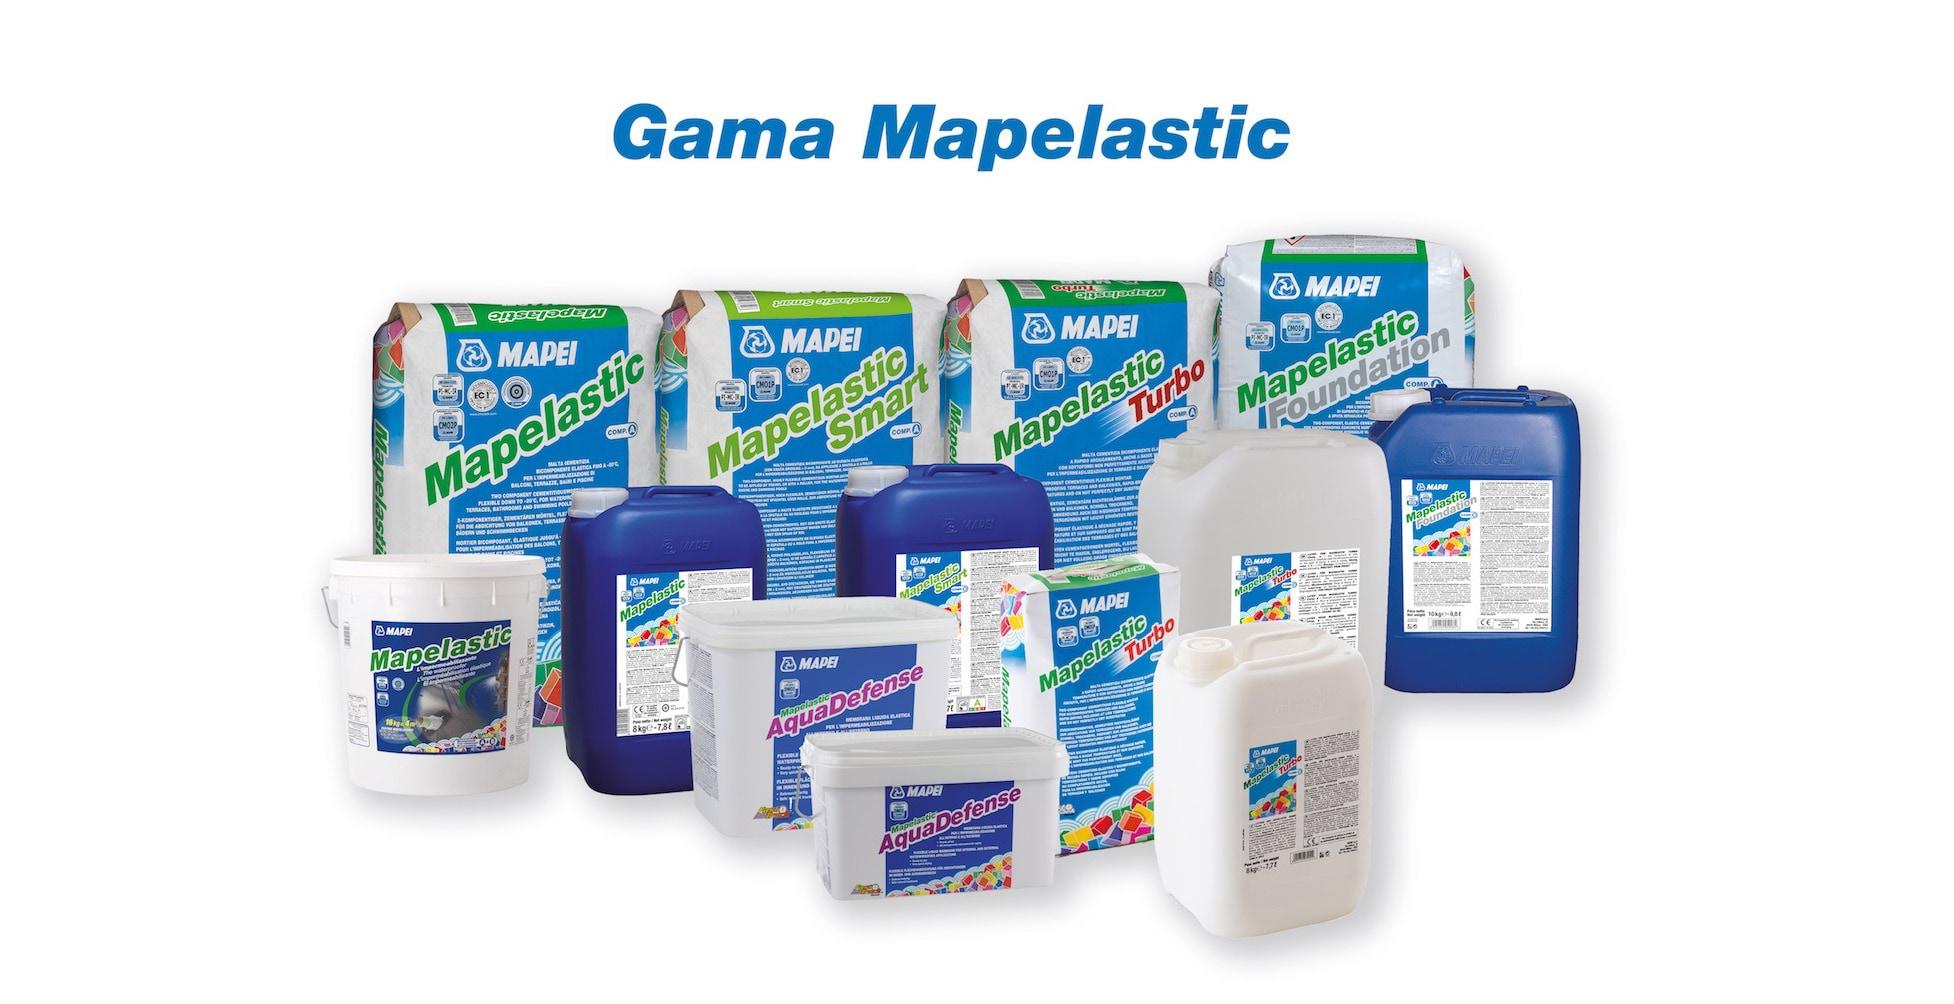 Gama-Mapelastic